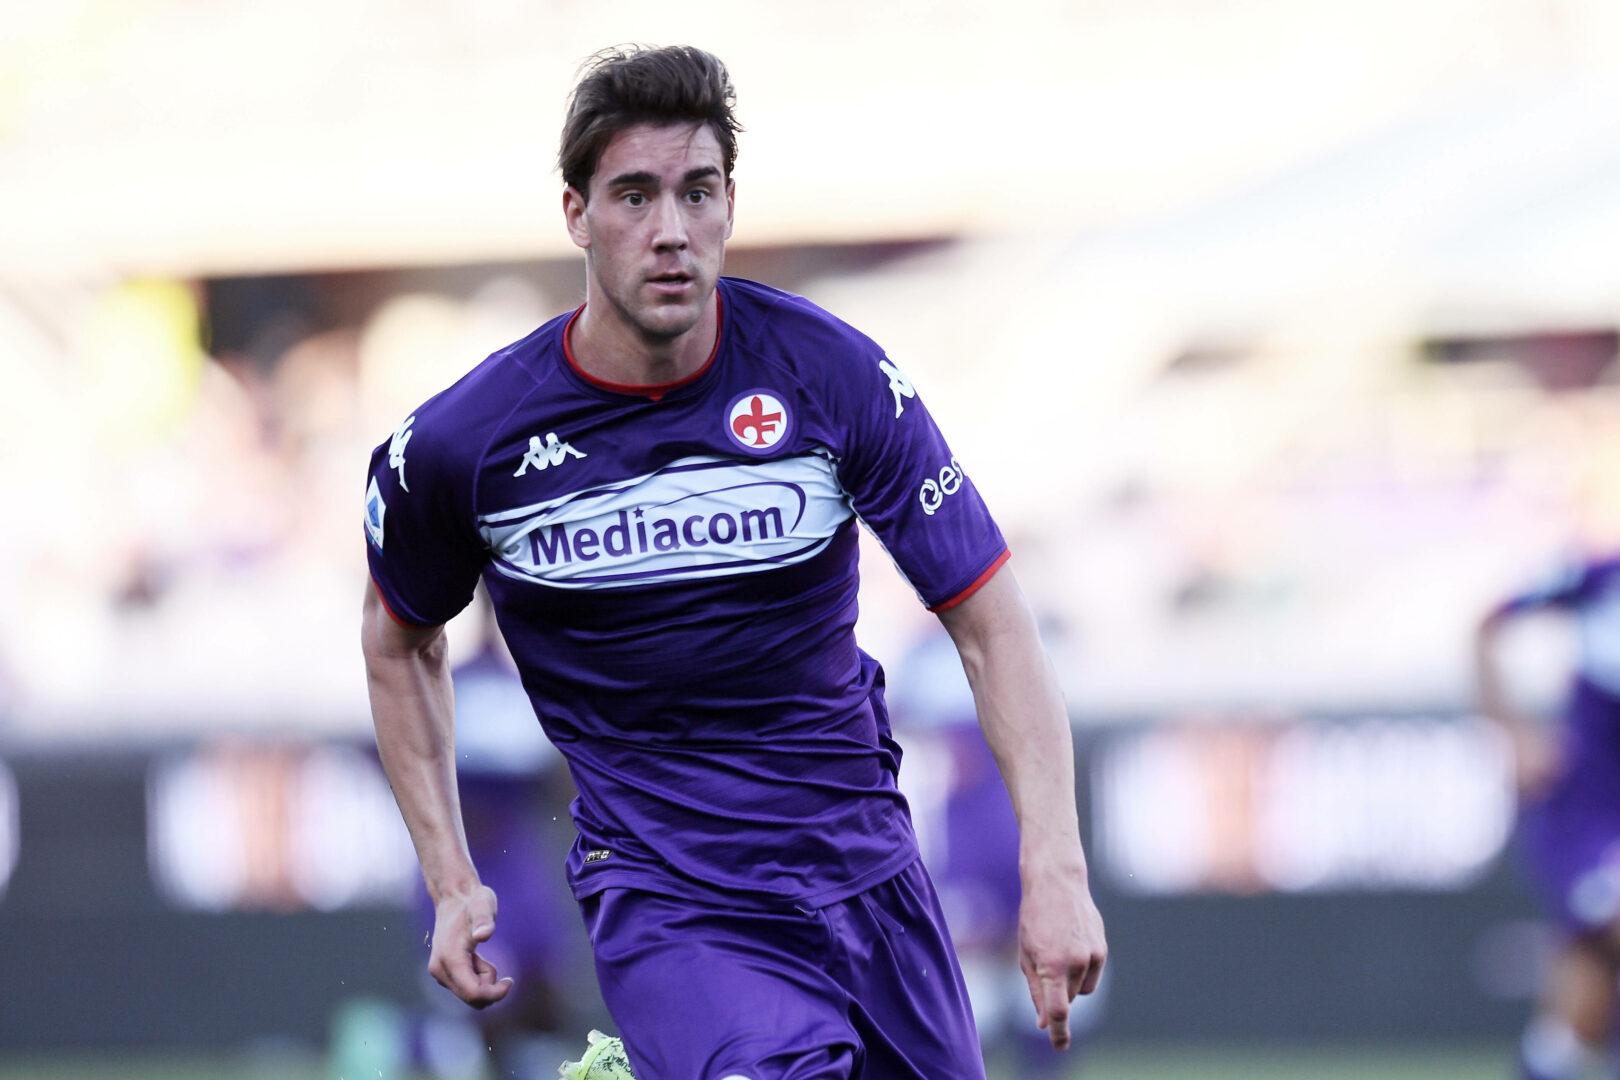 Fiorentina: Atletico intensiviert Bemühungen um Vlahovic